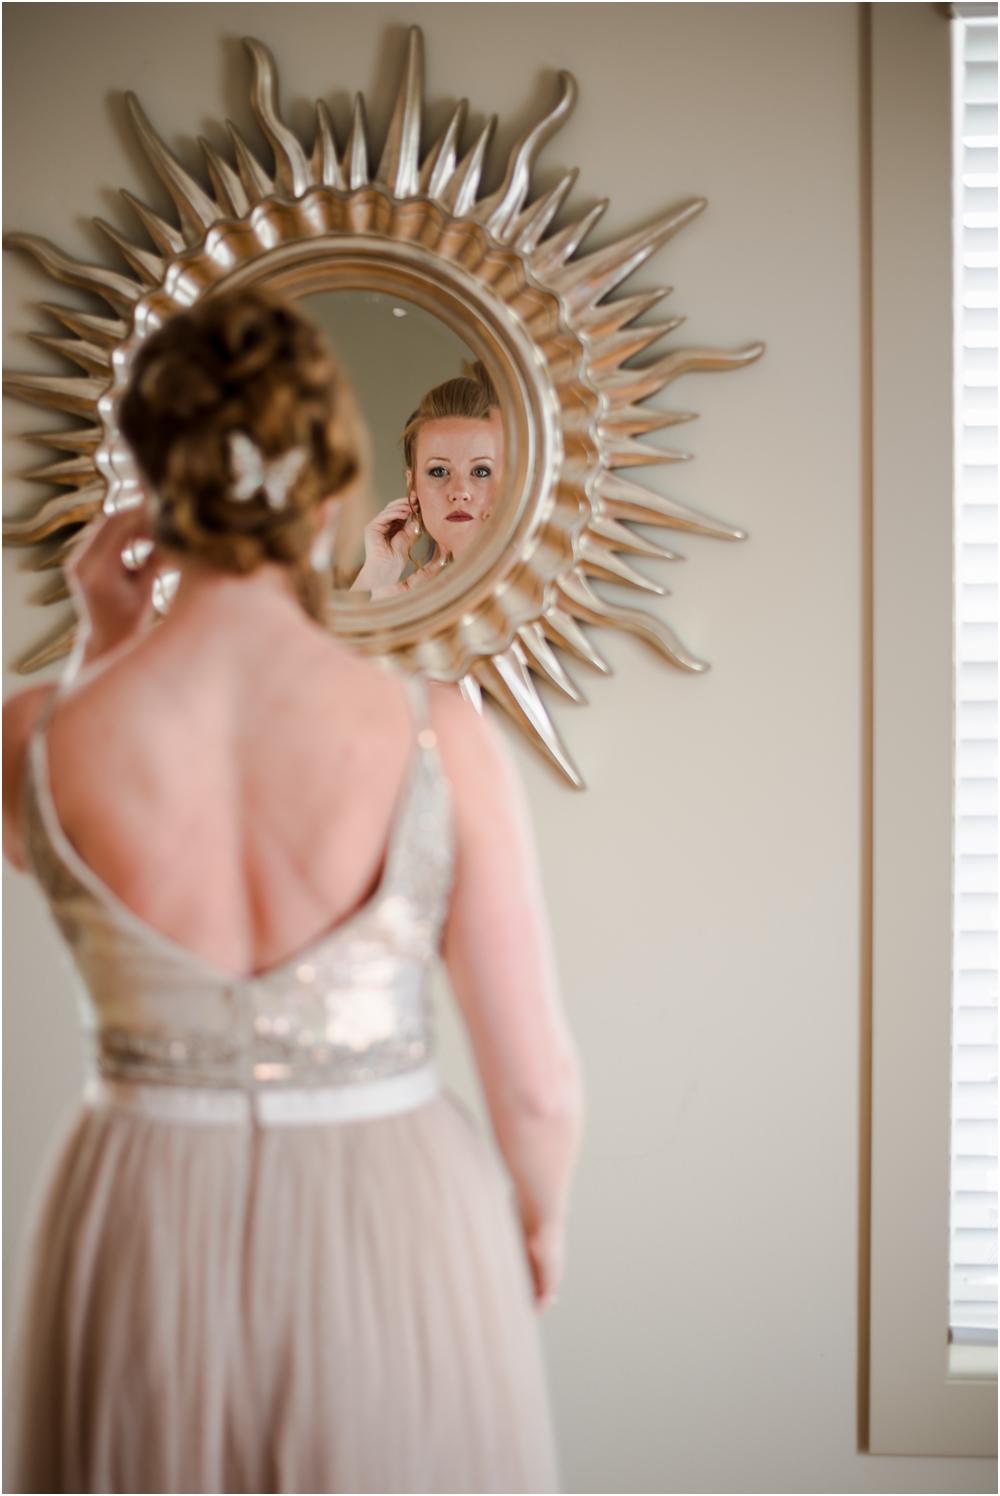 st-joe-florida-wedding-photographer-kiersten-grant-22.jpg